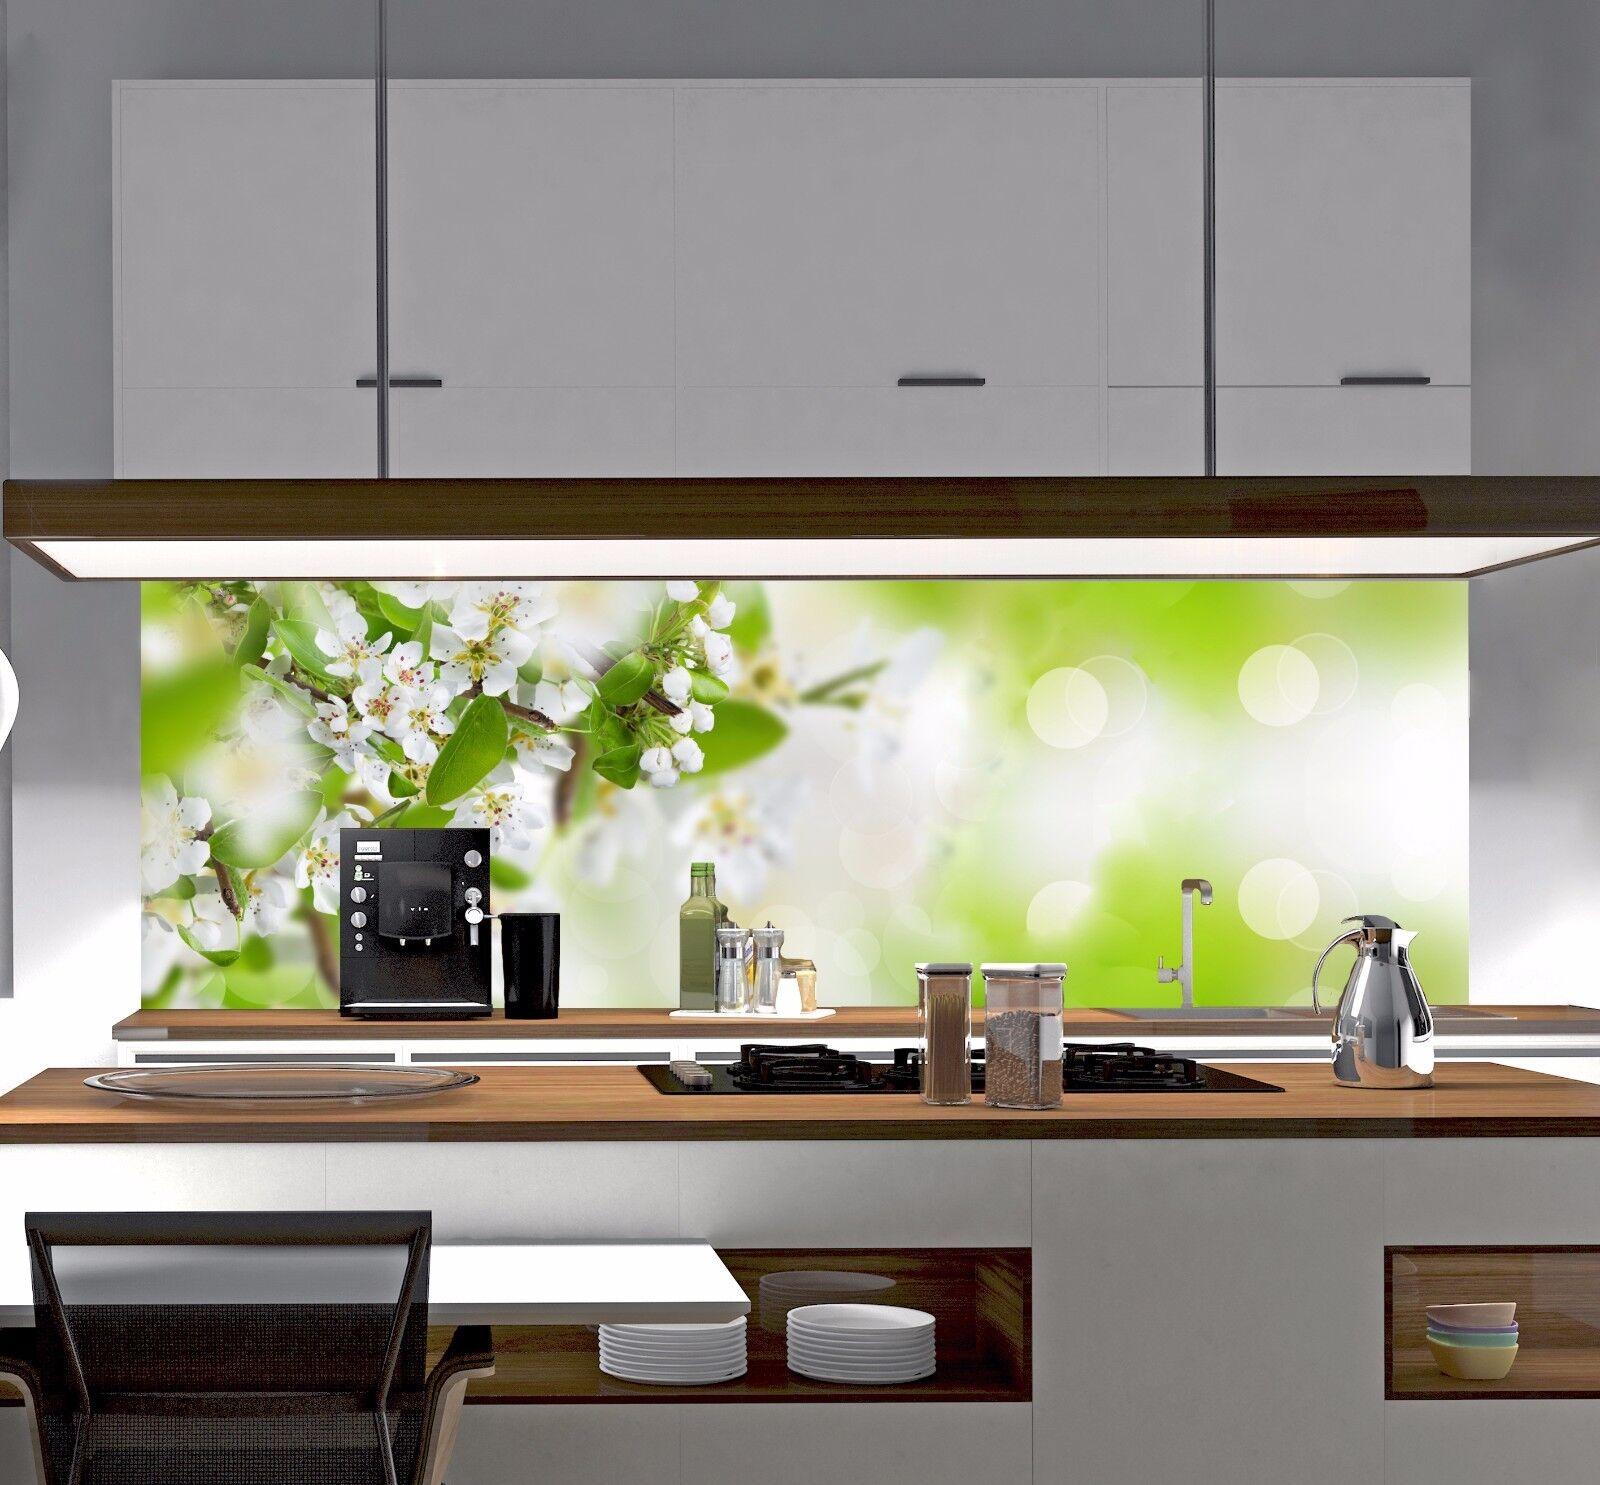 Küchenrückwand Küchenrückwand Küchenrückwand Spritzschutz ...